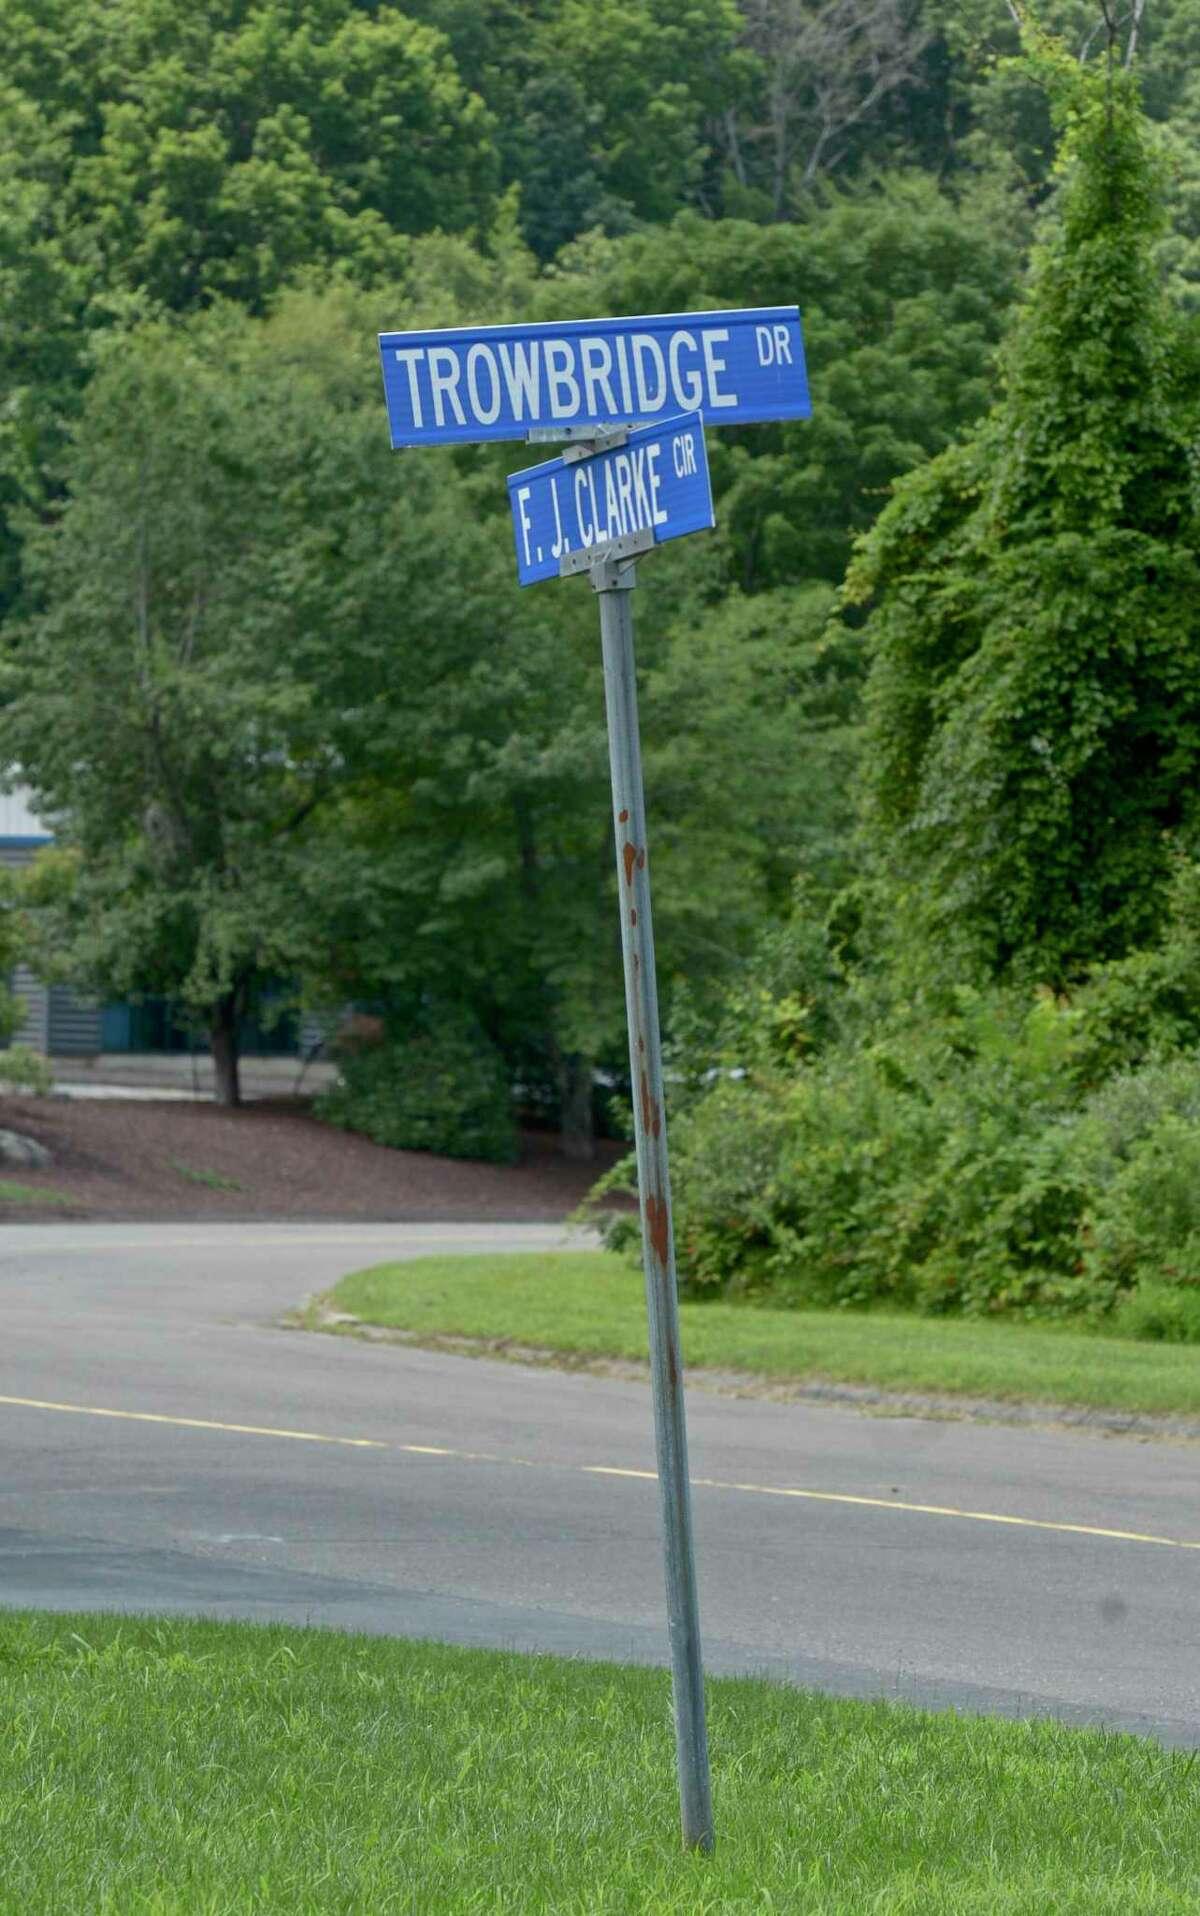 Trowbridge Drive in the Clarke Business Park in Bethel, Conn.